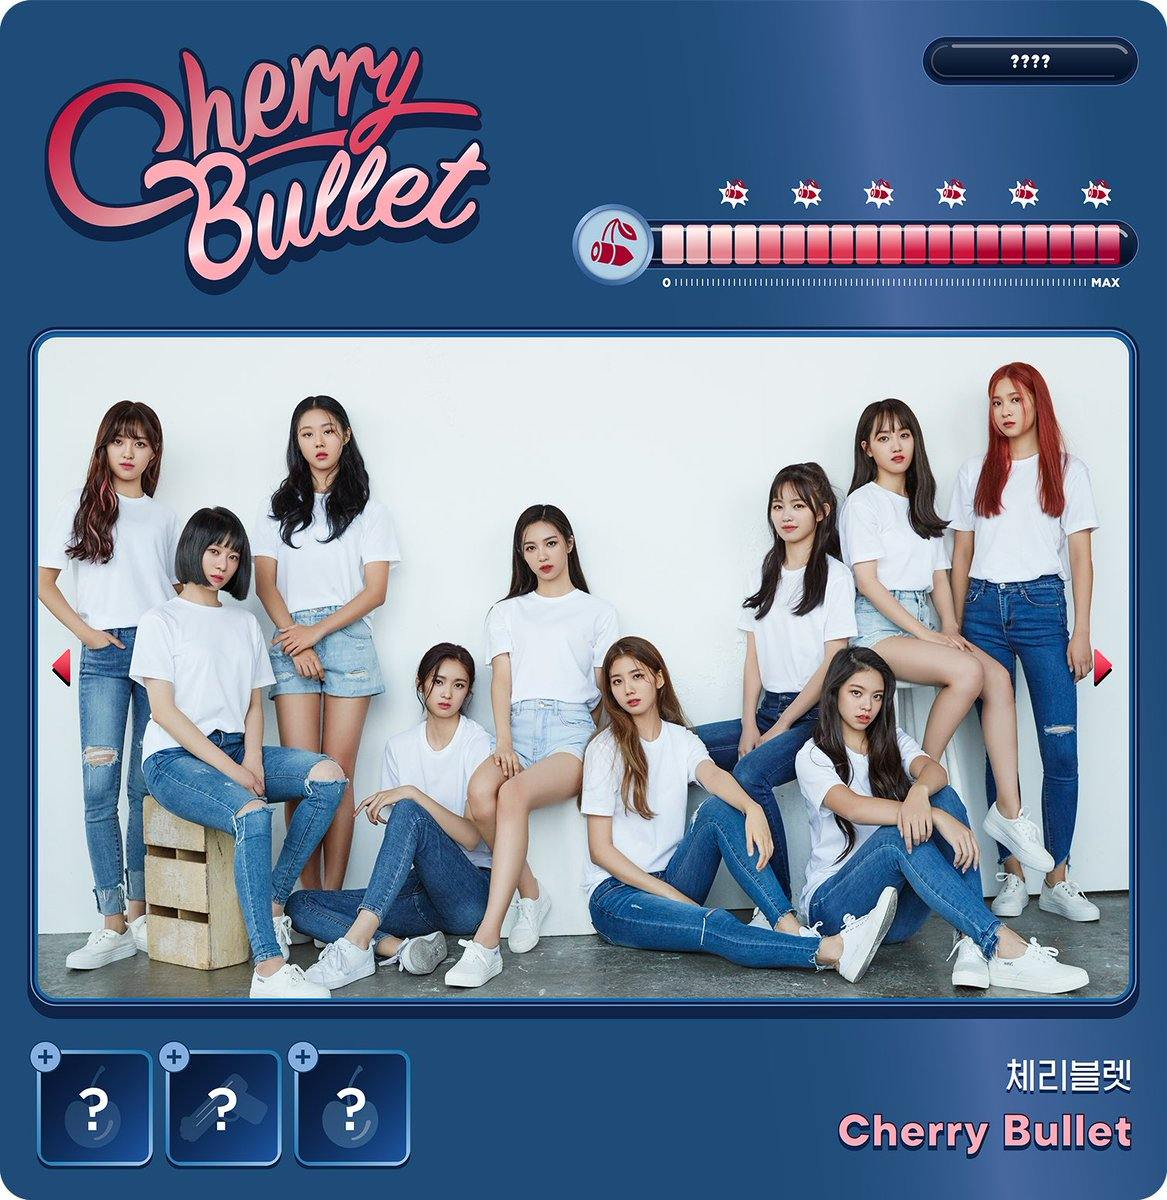 FNC娛樂自2012年推出性感女團AOA後,也預計在明年推出新的10人女團「Cherry Bullet」!師妹們是否也會像AOA一樣走性感路線,要等她們出道才會知道了XD